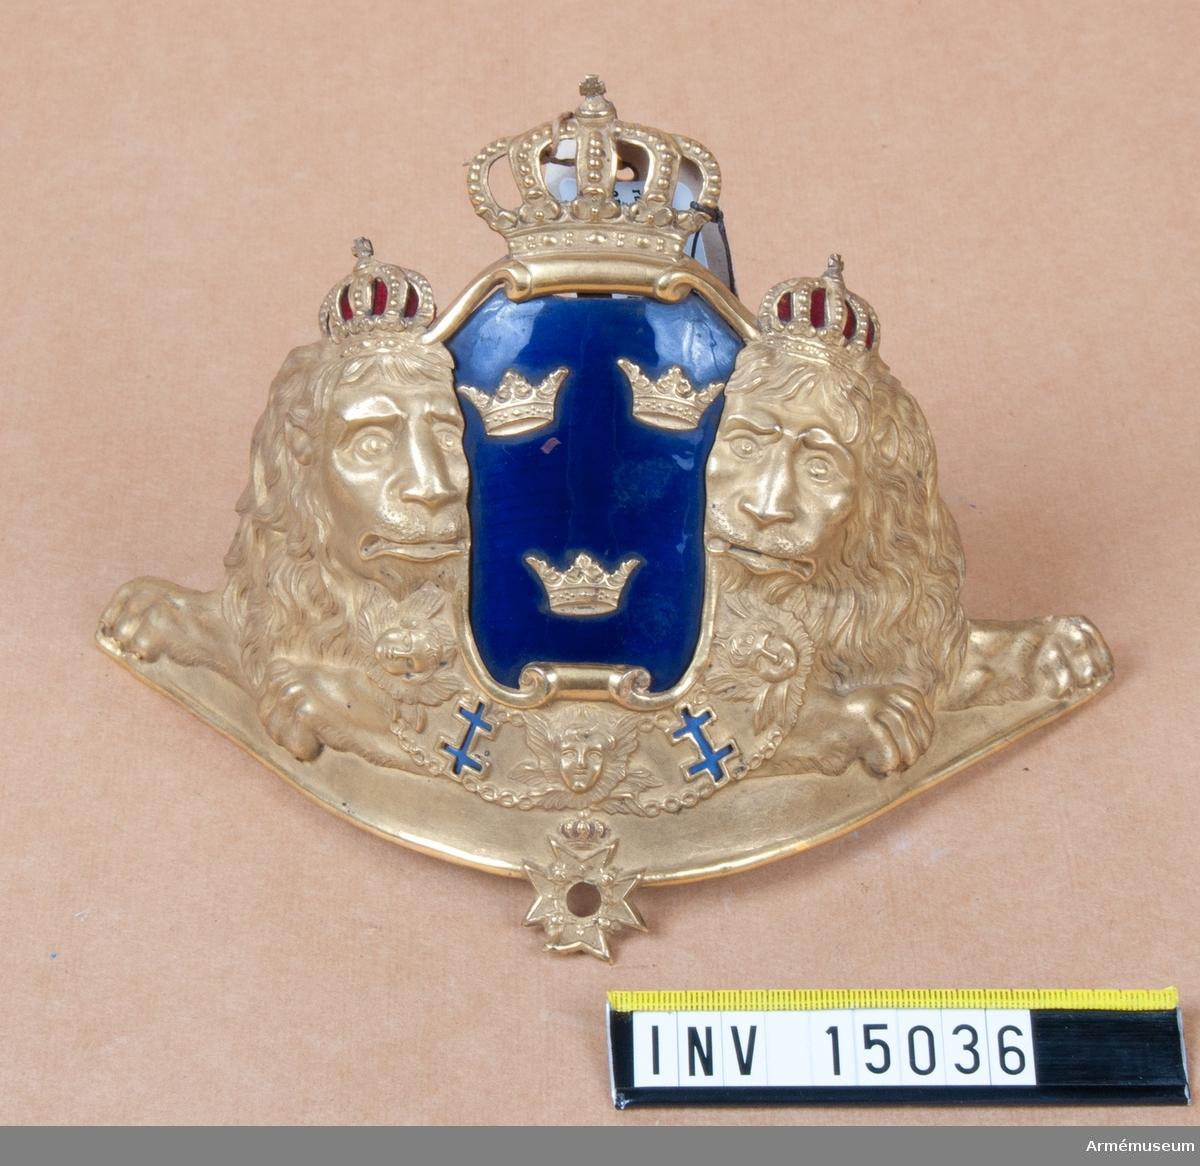 Grupp C. Ink. av juden J. Levy 1888-12-10. Stockholm. På plåten står: gåva av gördelmakaren H.B. Hultman, Stockholm.